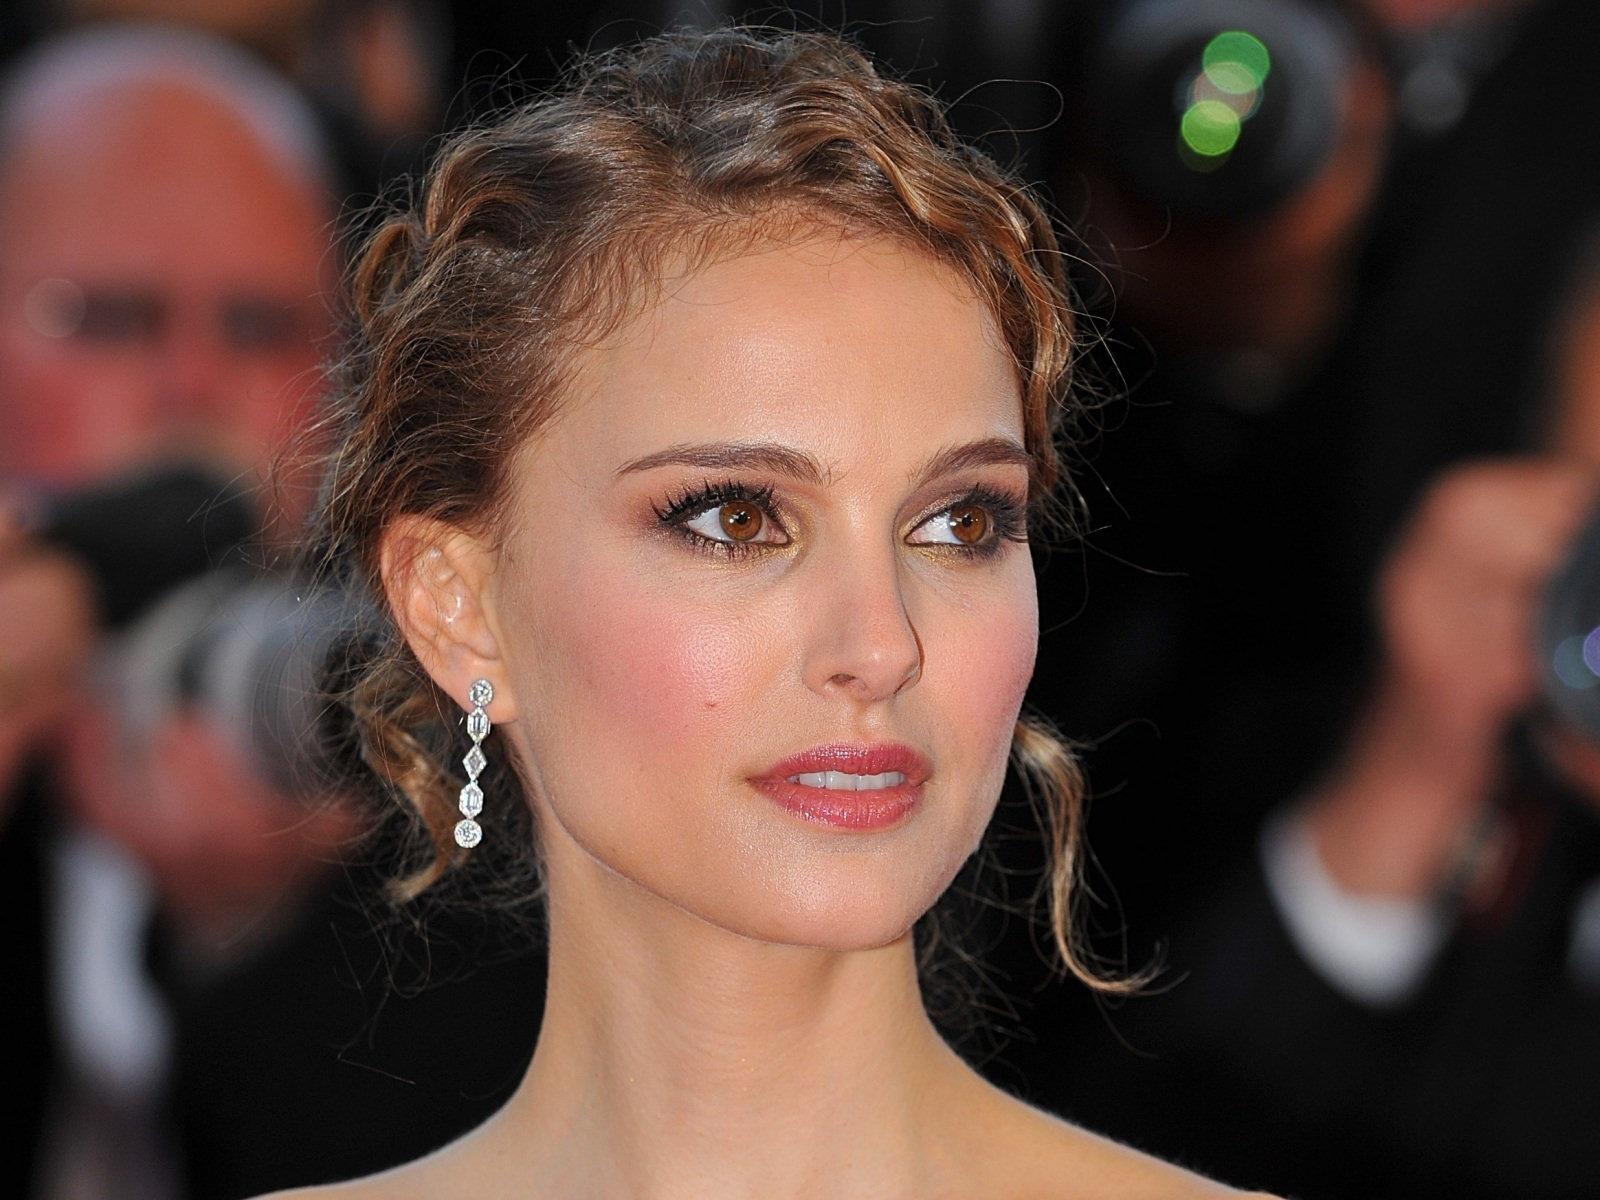 Top 10 Most Beautiful Israeli Women in 2015 - Top Medias